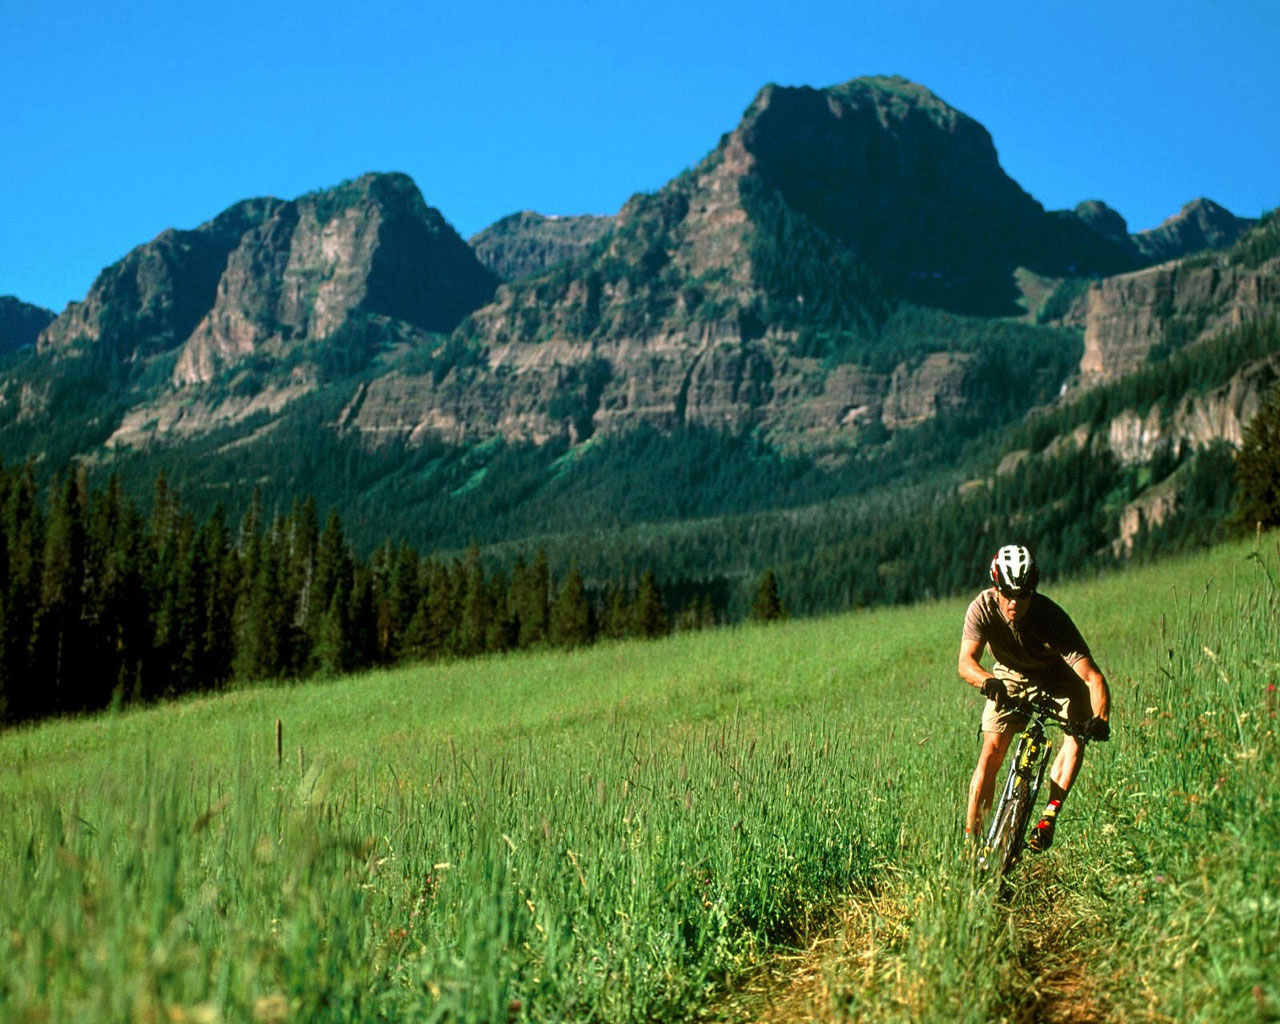 http://2.bp.blogspot.com/_sJs7axgwgHI/TIOyXZr_FnI/AAAAAAAABGE/wOYFljKR6Bo/s1600/ciclismo-de-montana1++rubencg+files+wordpress+com.jpg